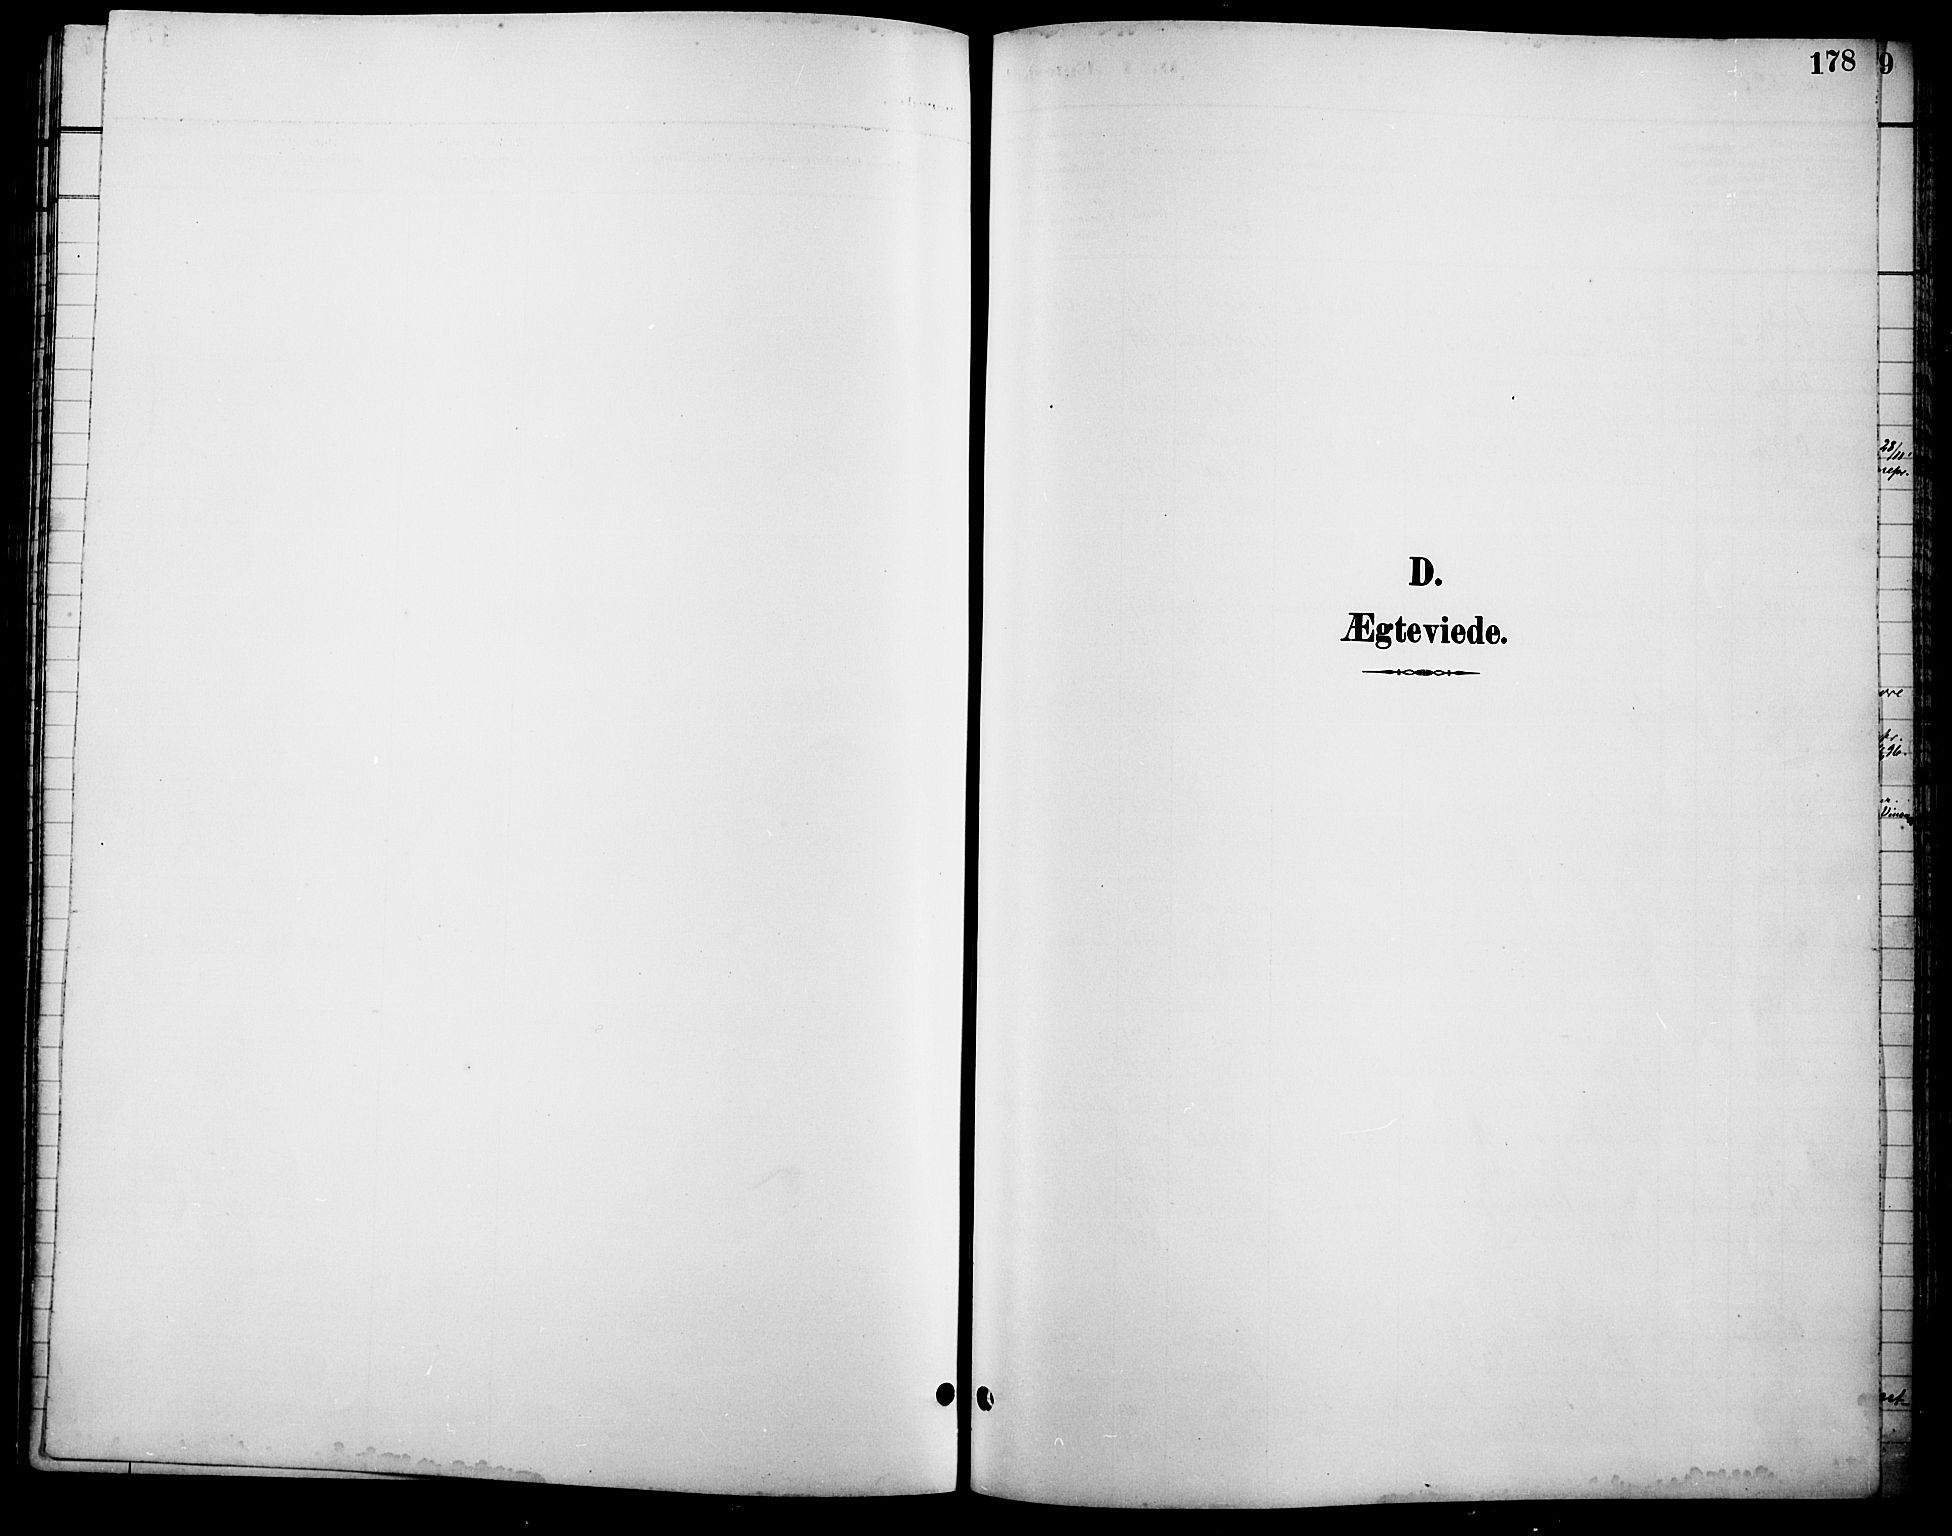 SAH, Lesja prestekontor, Klokkerbok nr. 7, 1895-1919, s. 178